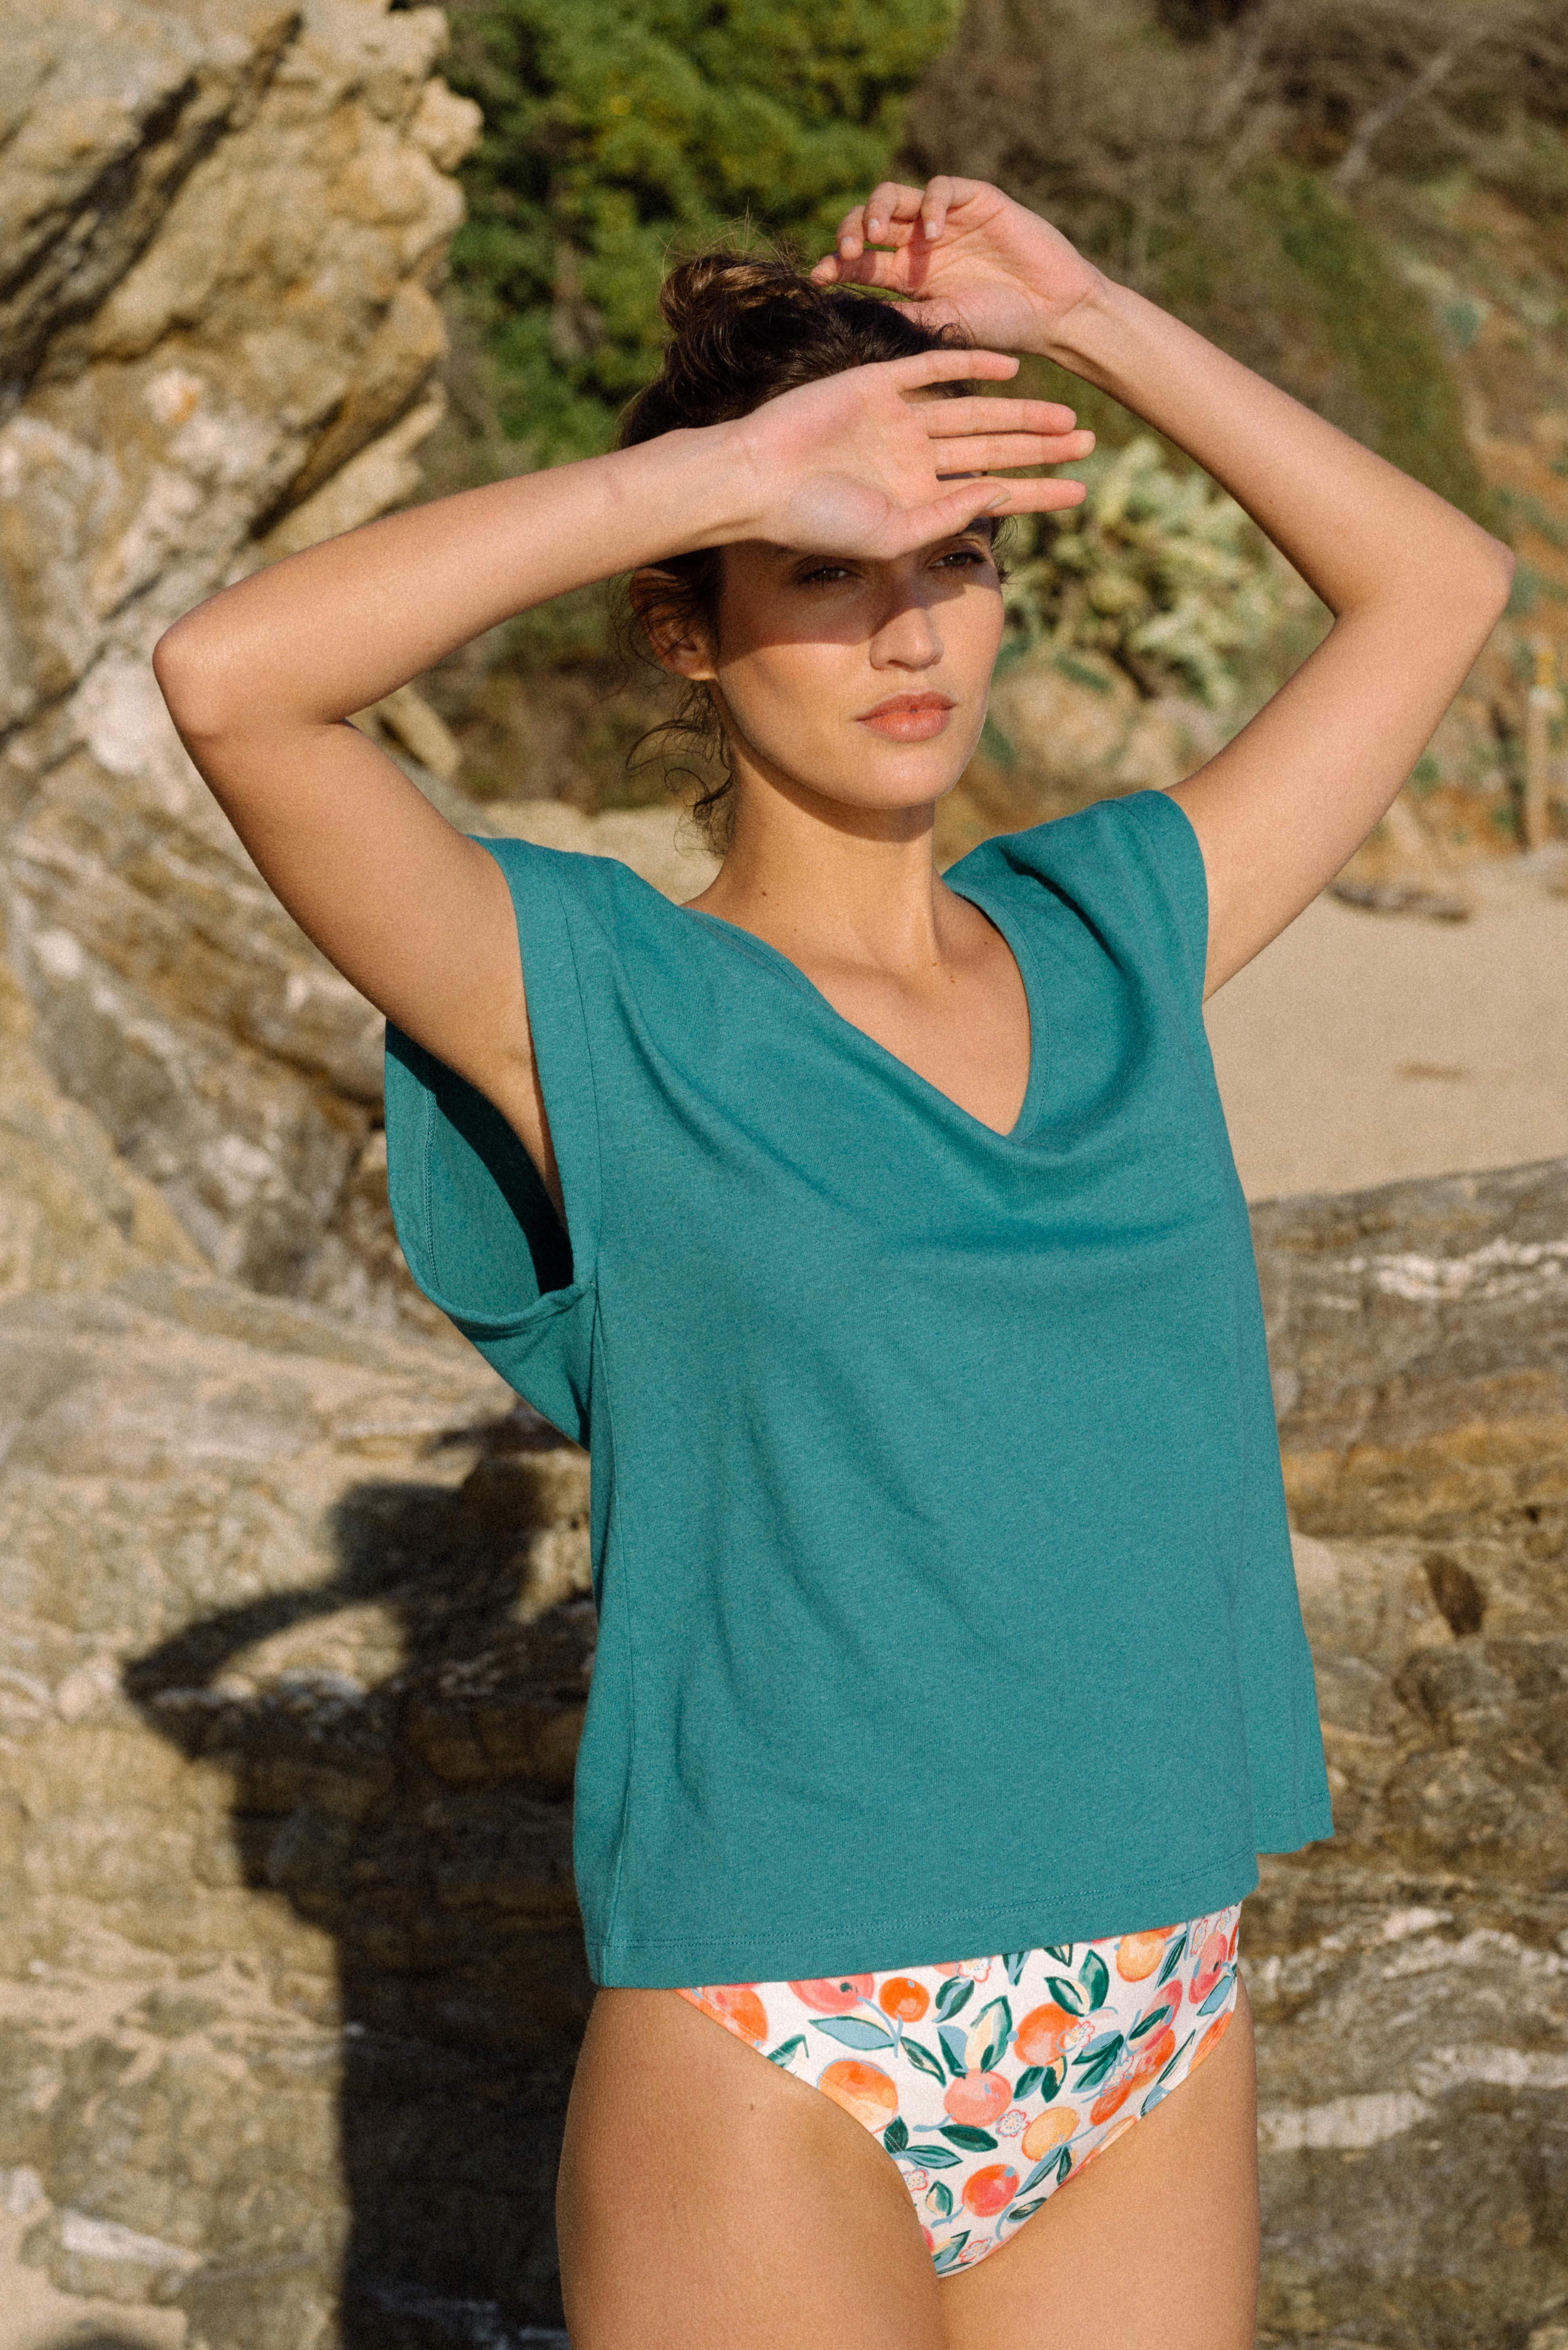 Tee shirt Balade rêveuse Bleu lagon